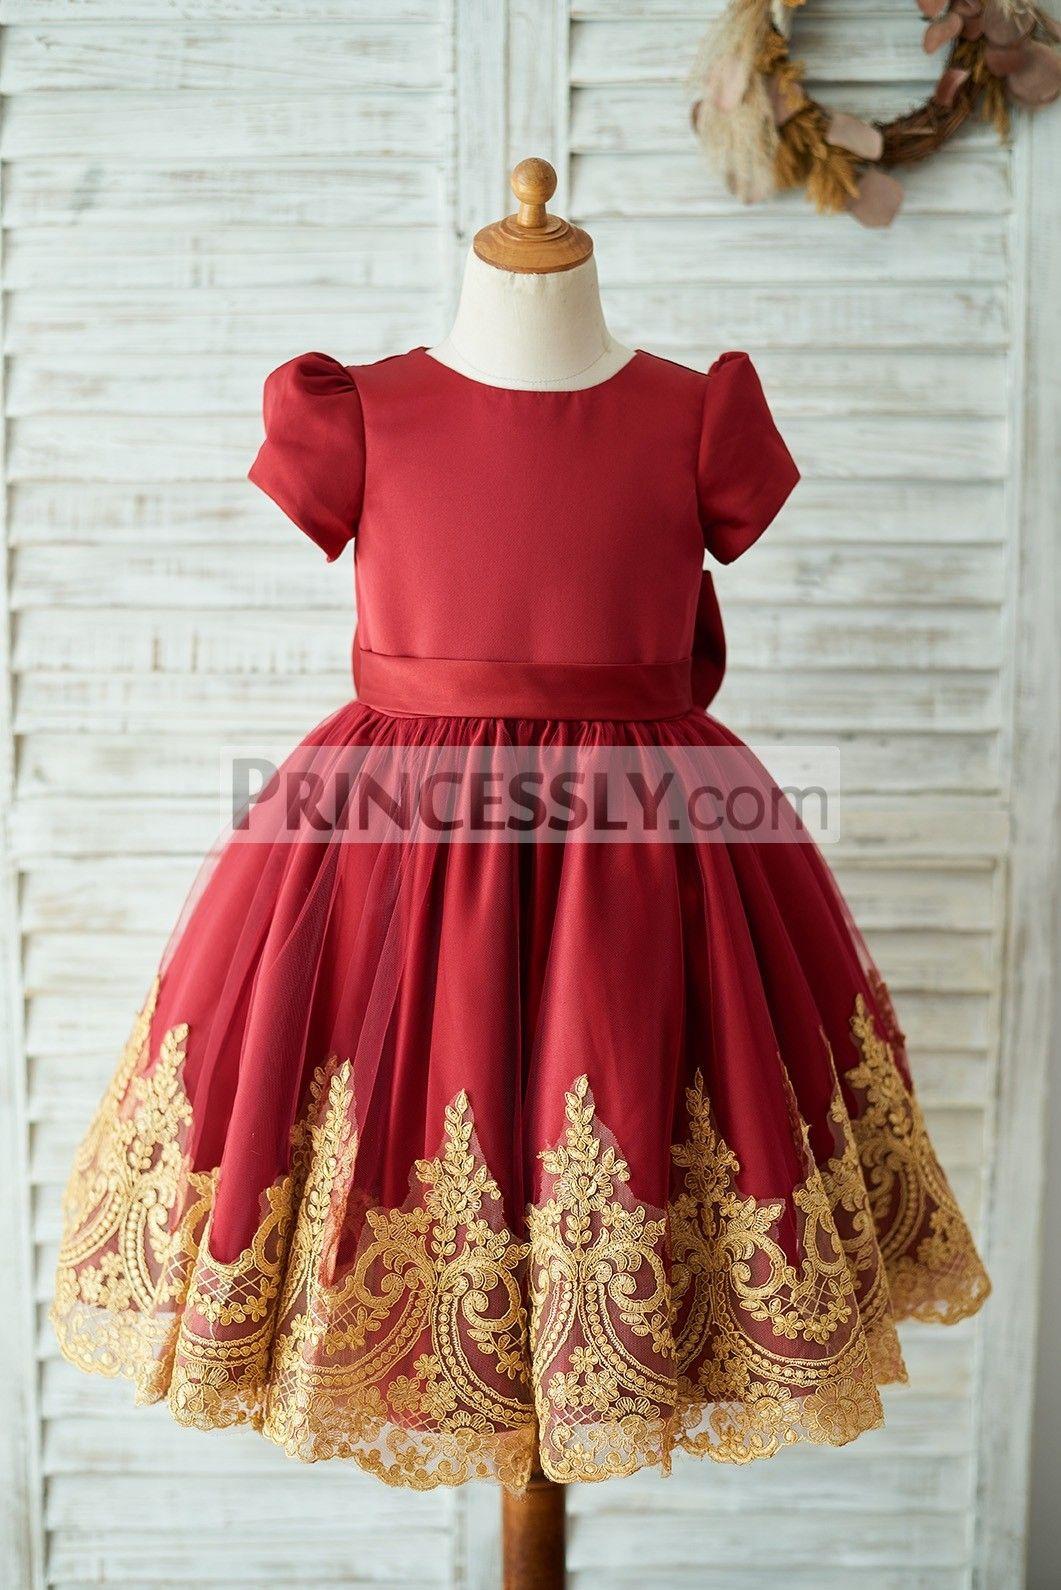 Red satin gold lace short sleeves keyhole back wedding flower girl